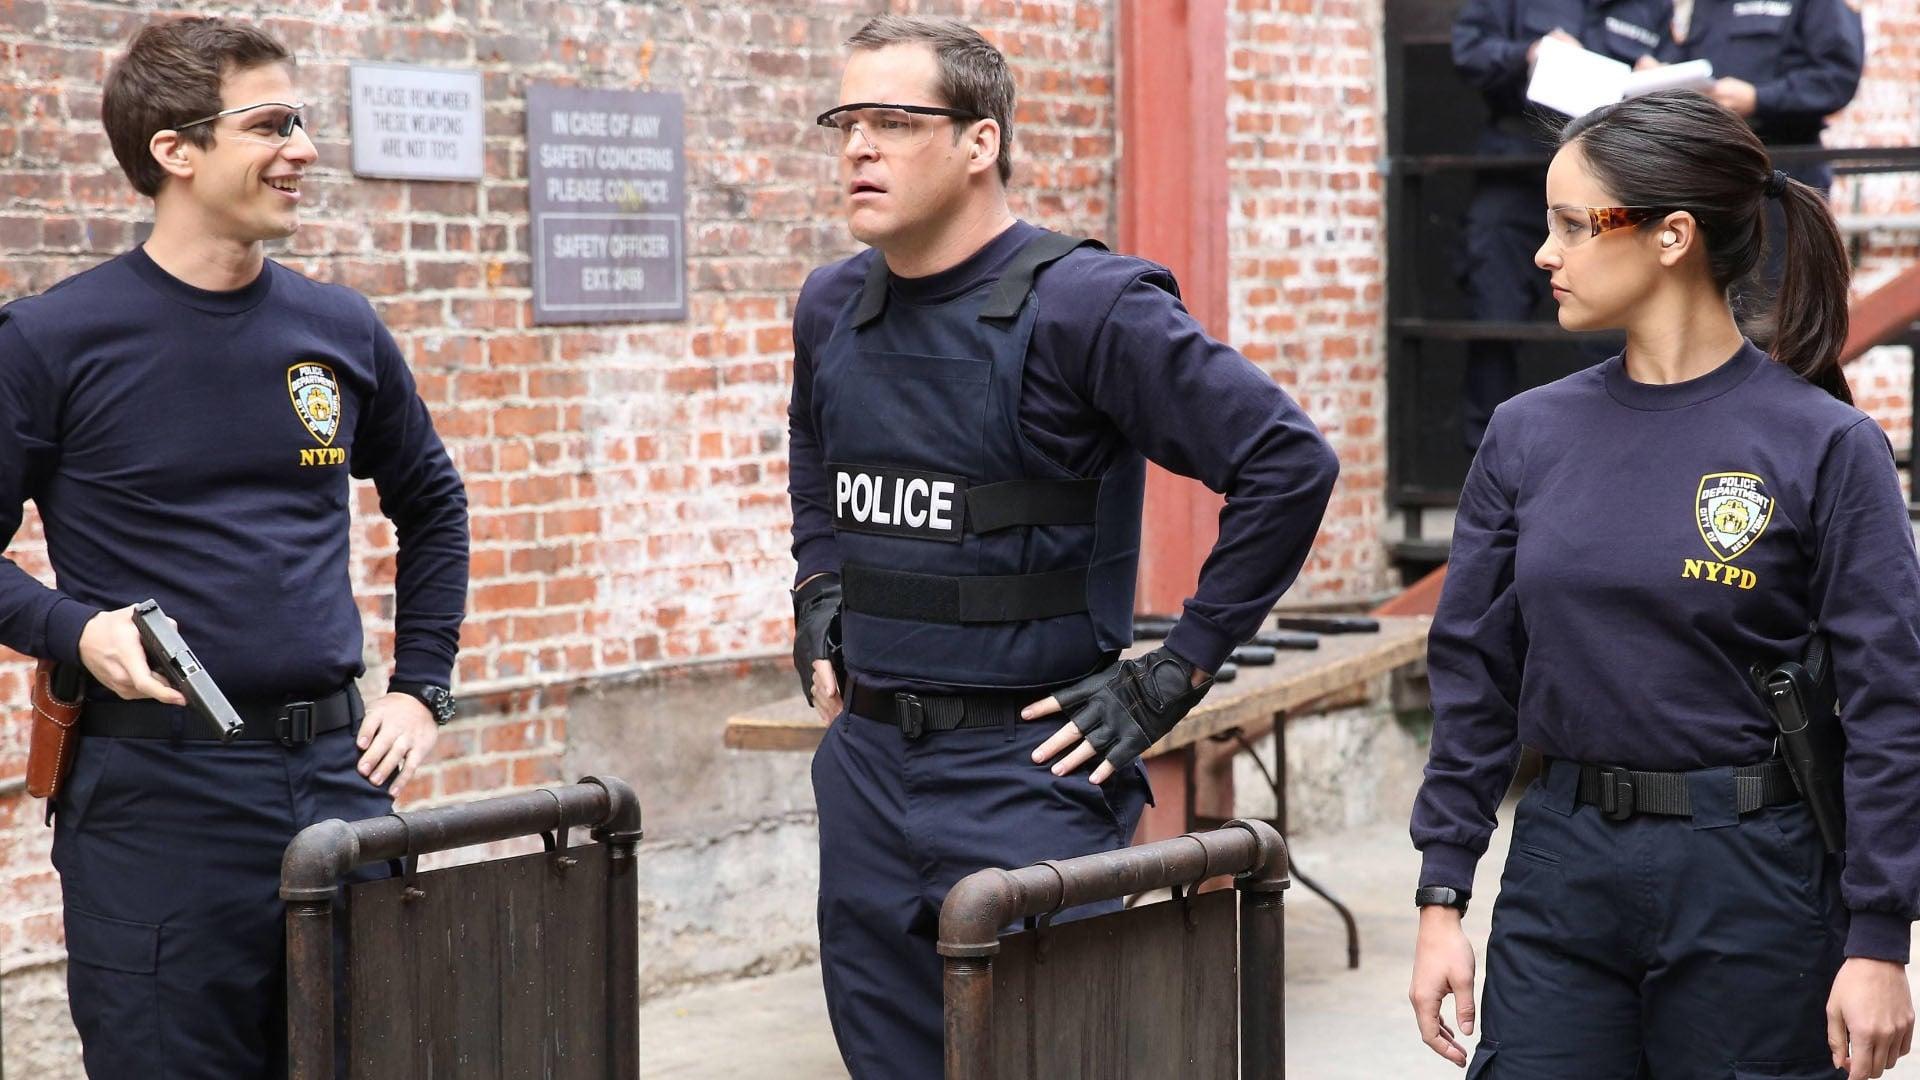 Brooklyn Nine-Nine - Season 1 Episode 19 : Tactical Village